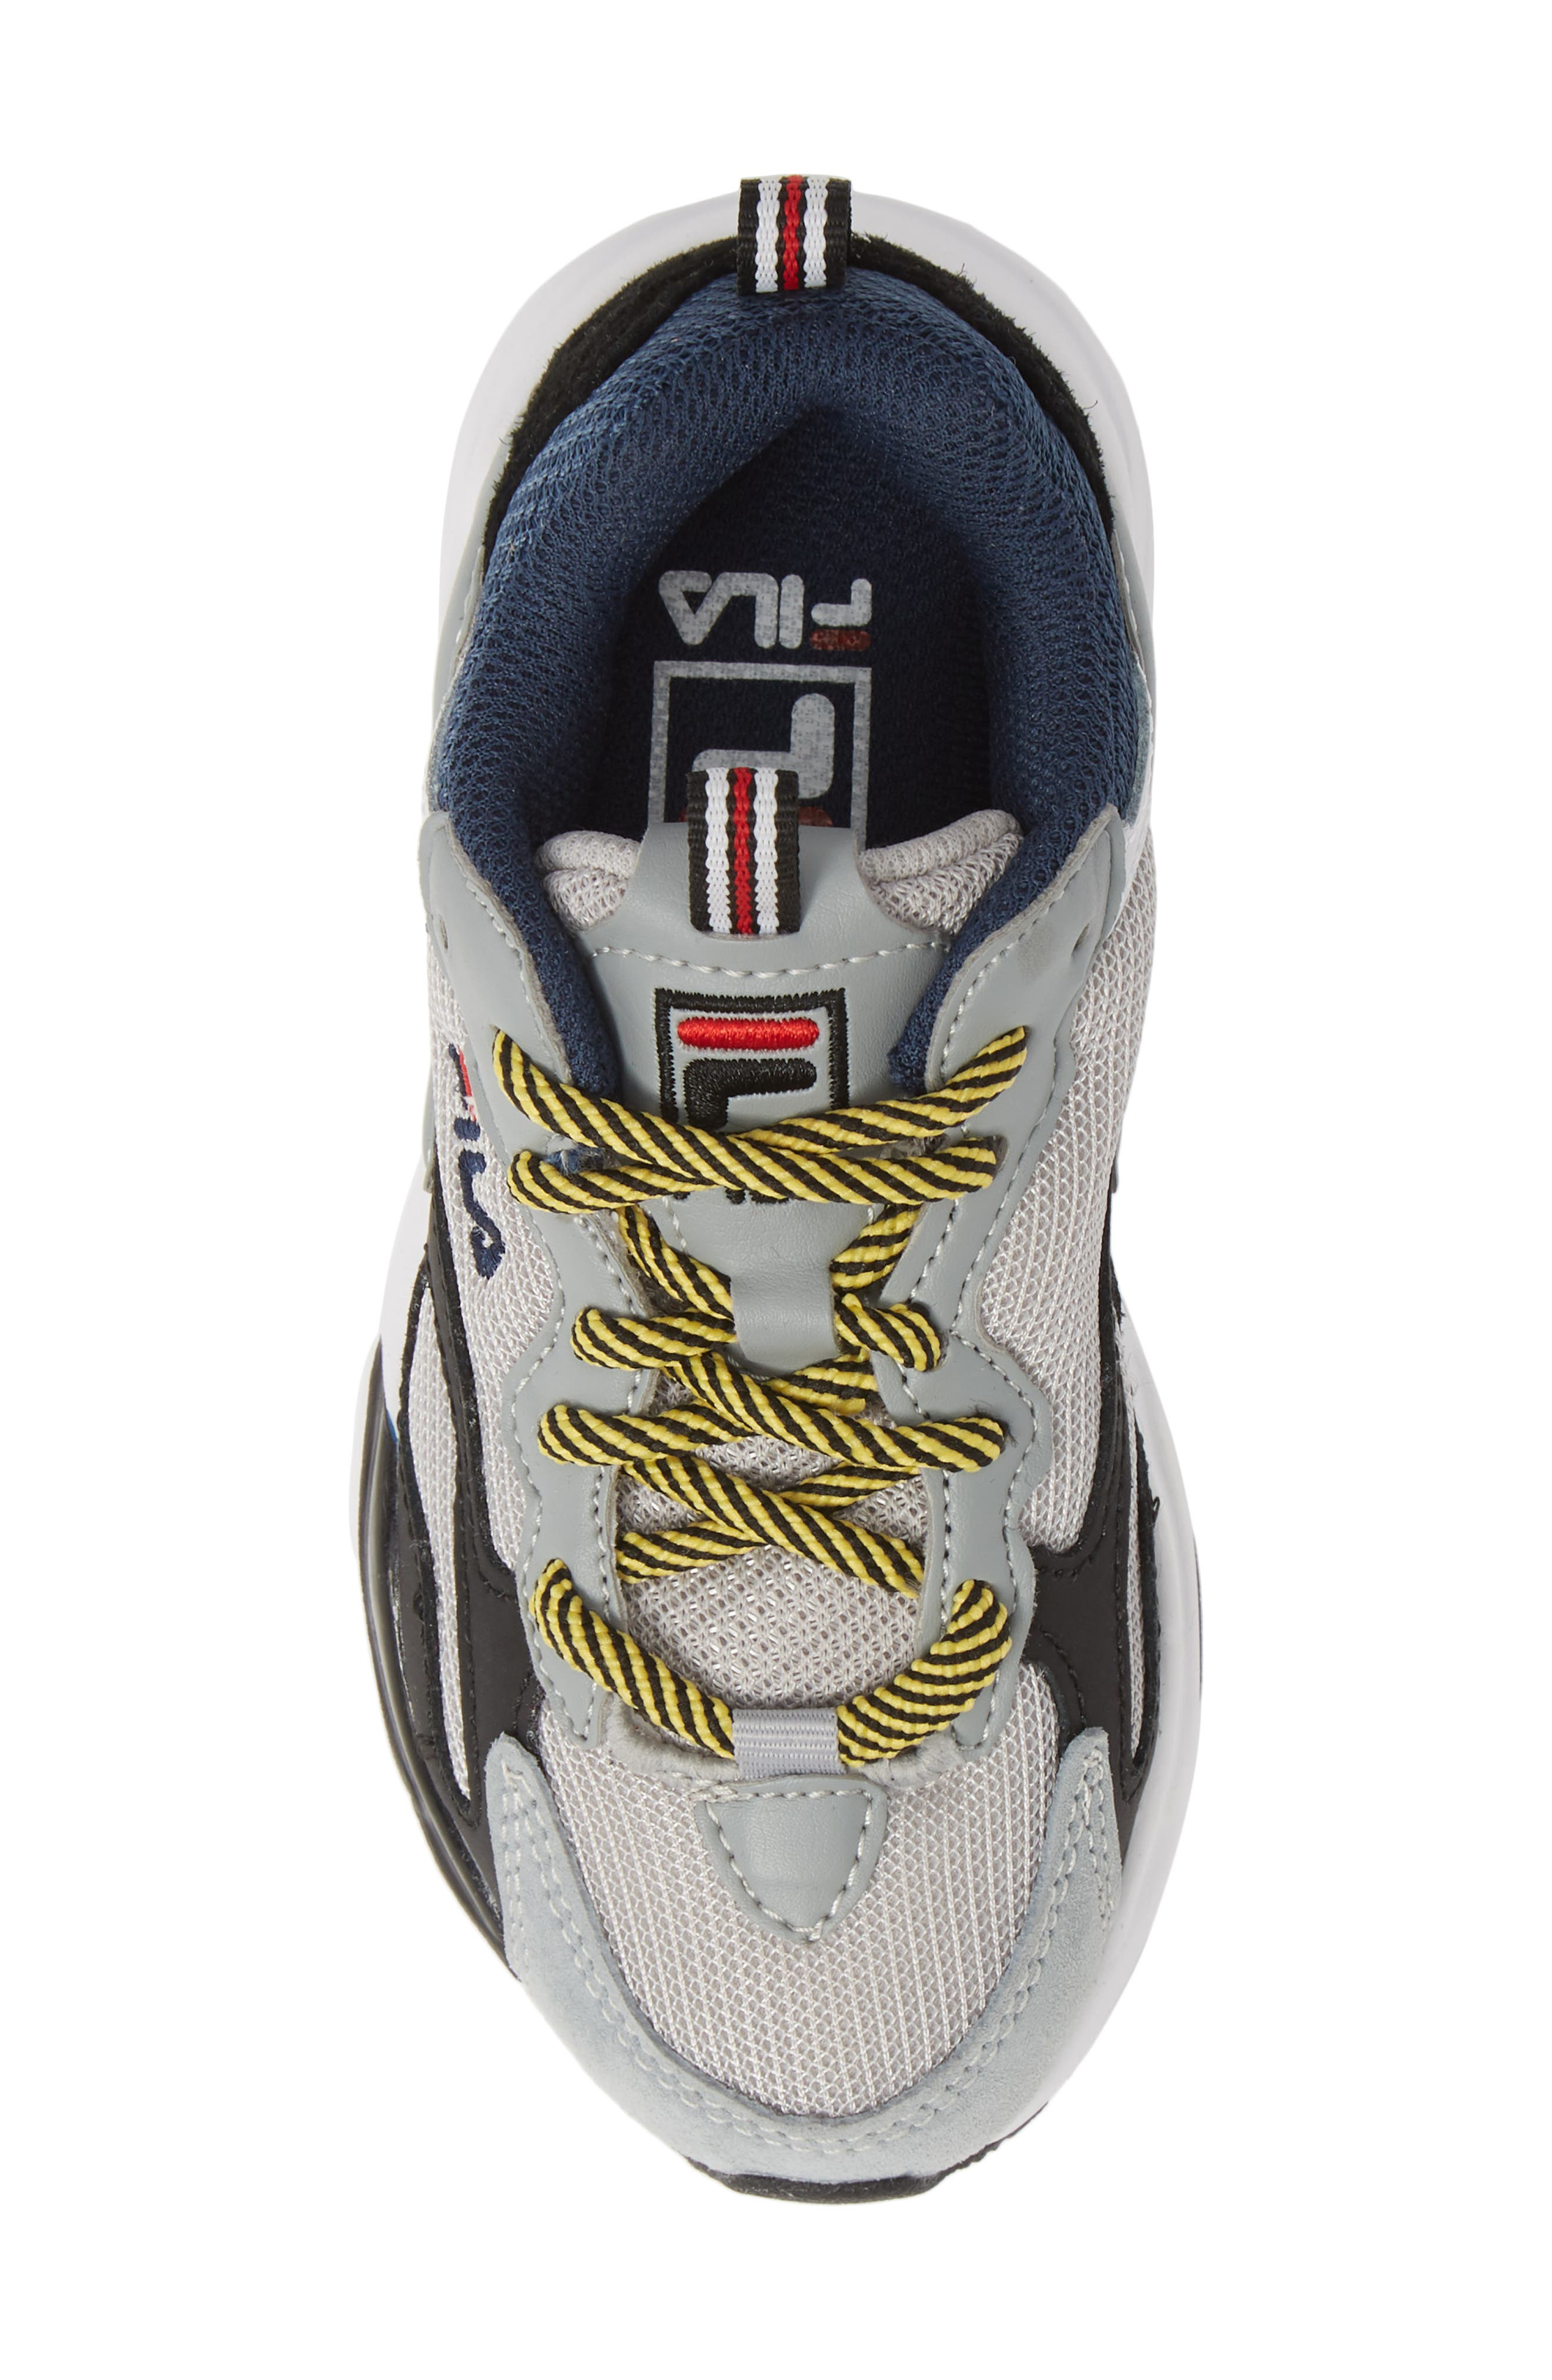 FILA,                             Ray Tracer Sneaker,                             Alternate thumbnail 5, color,                             VAPOR BLUE/ HIGHRISE/ BLACK